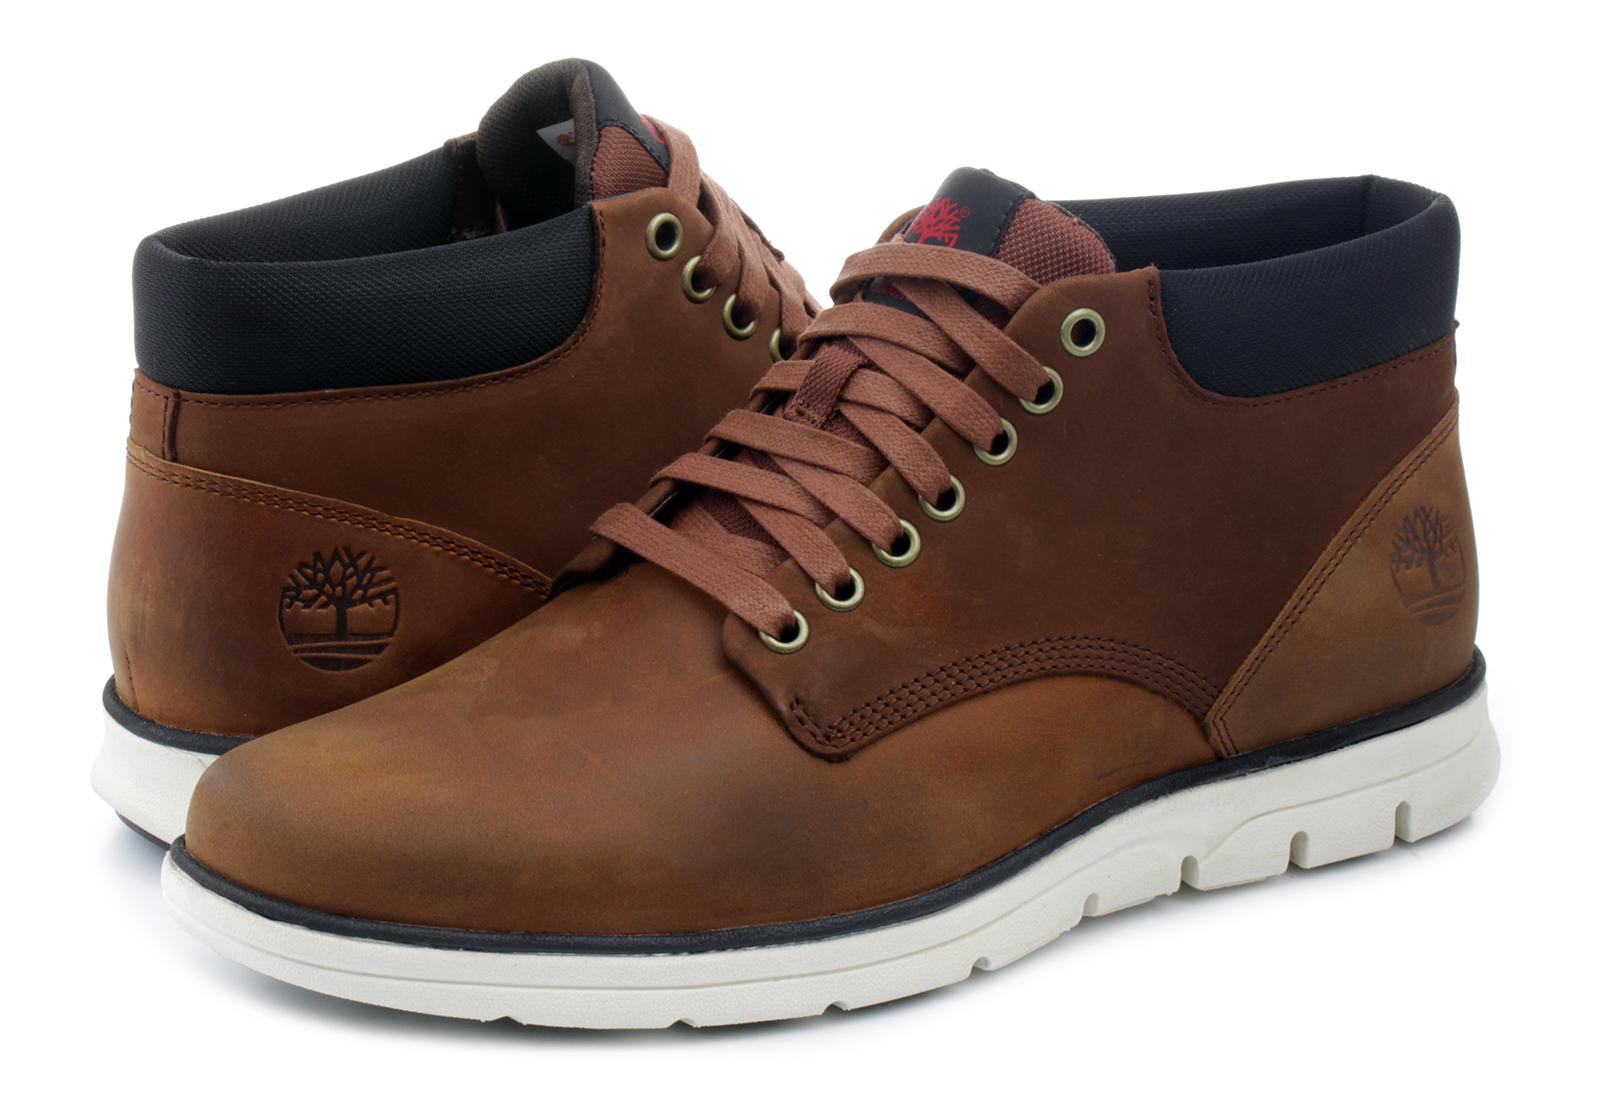 Timberland Boots - Bradstreet Chukka - a13ee-brn